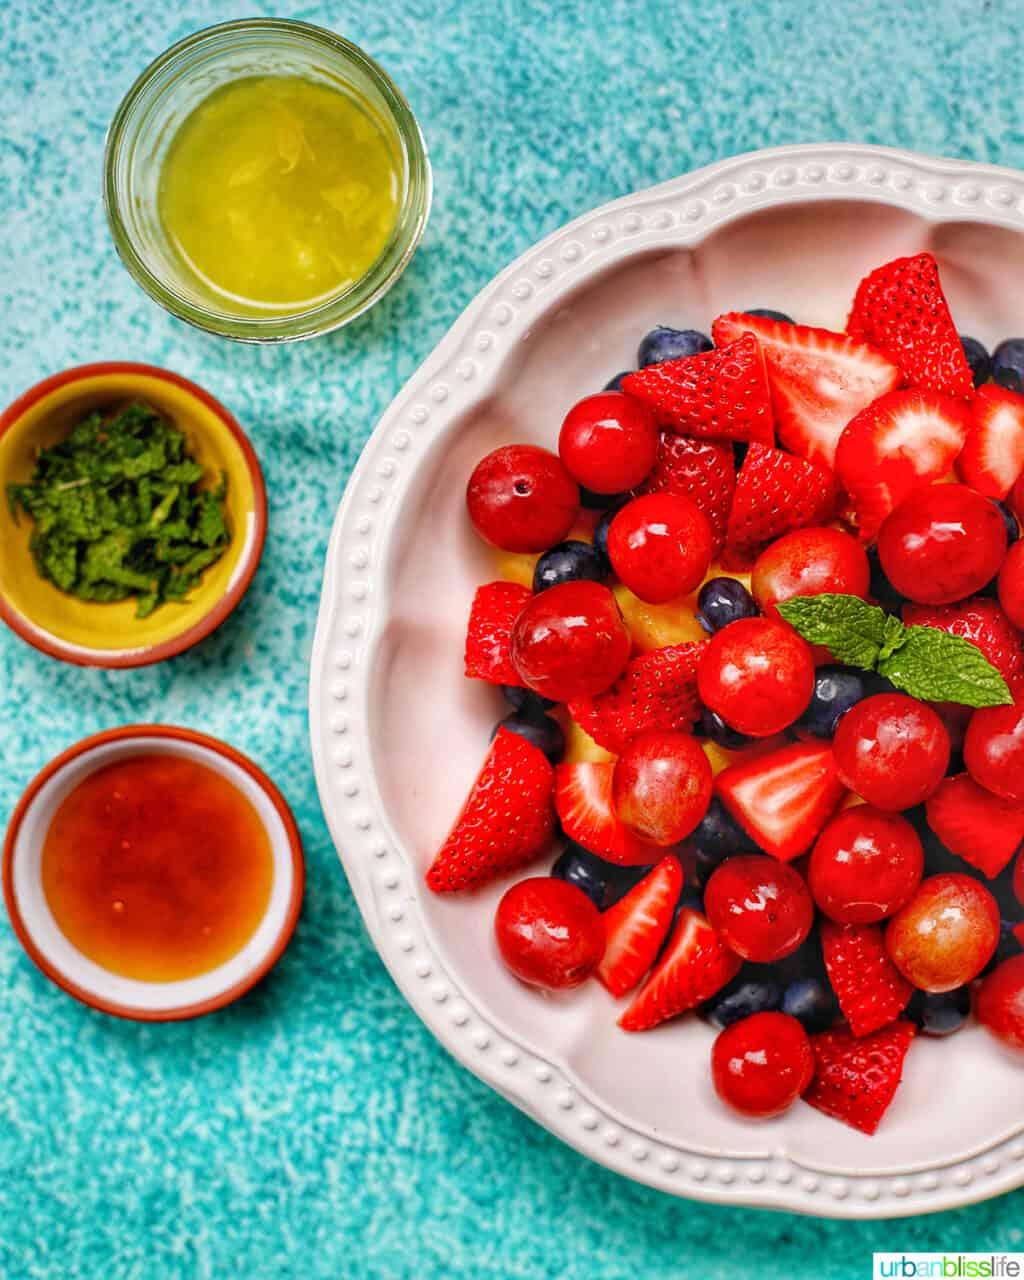 making simple fruit salad bowls of ingredients